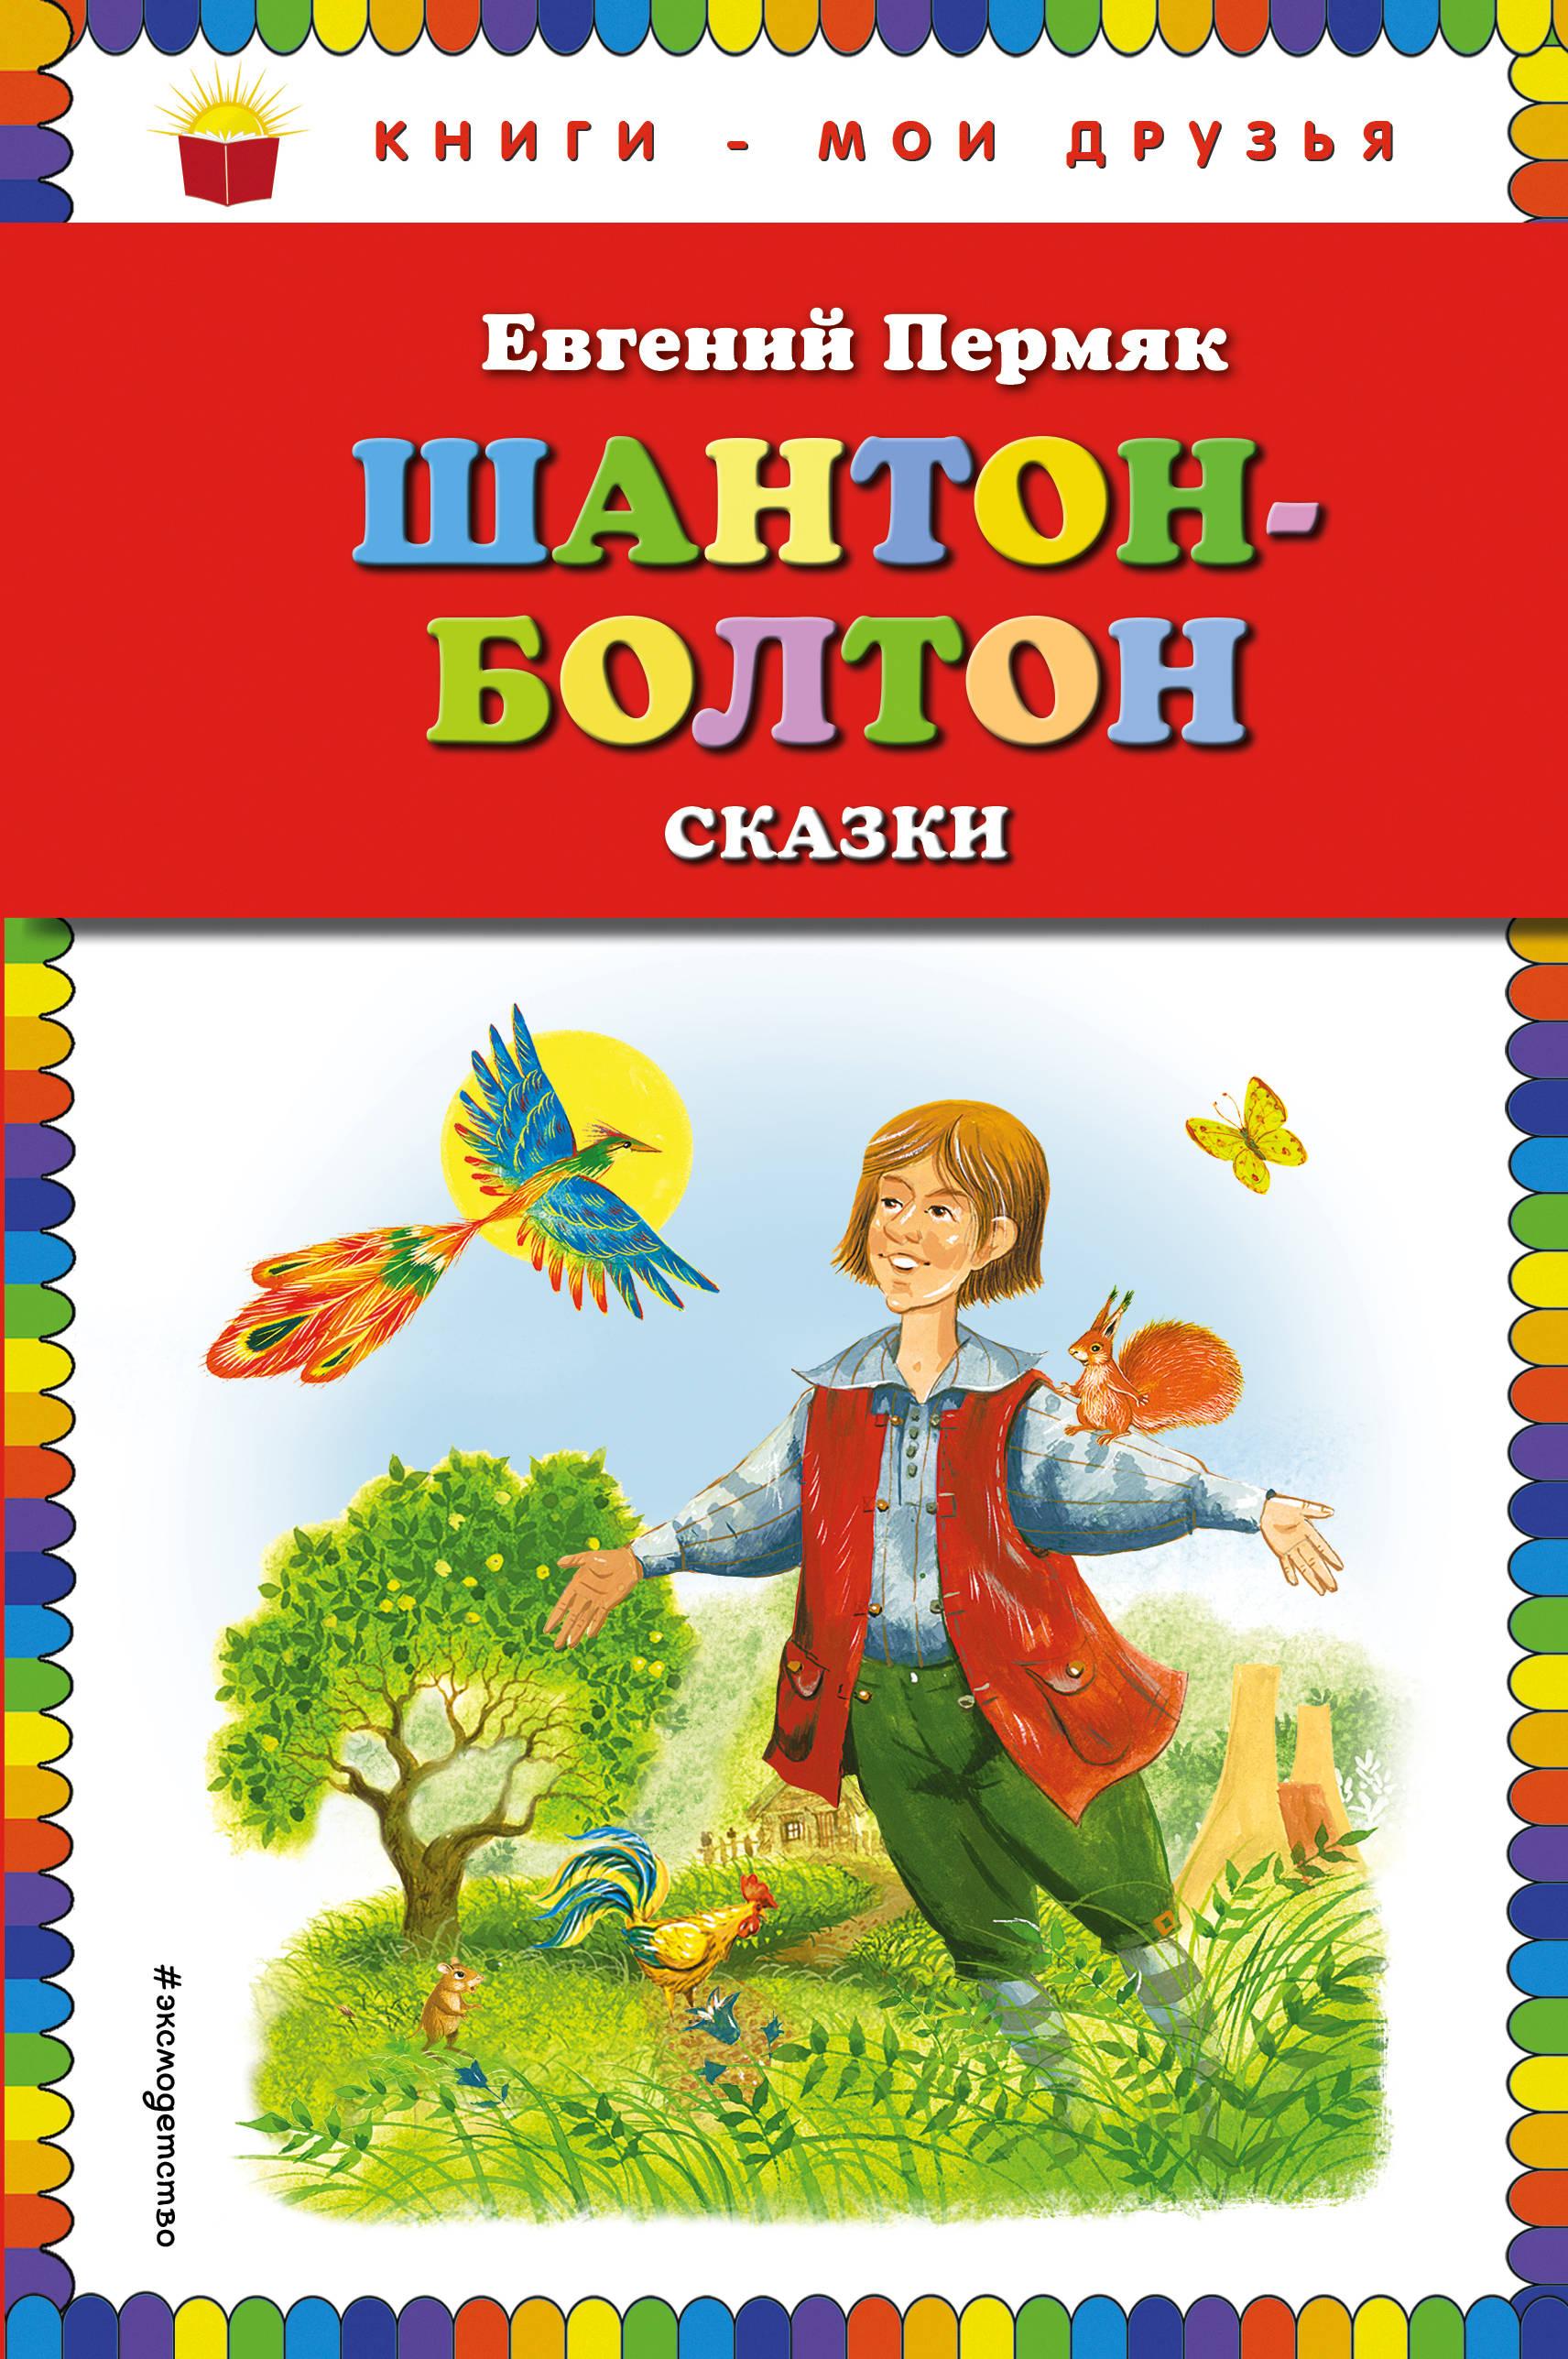 Евгений Пермяк Шантон-Болтон. Сказки евгений пермяк далматова фартуната